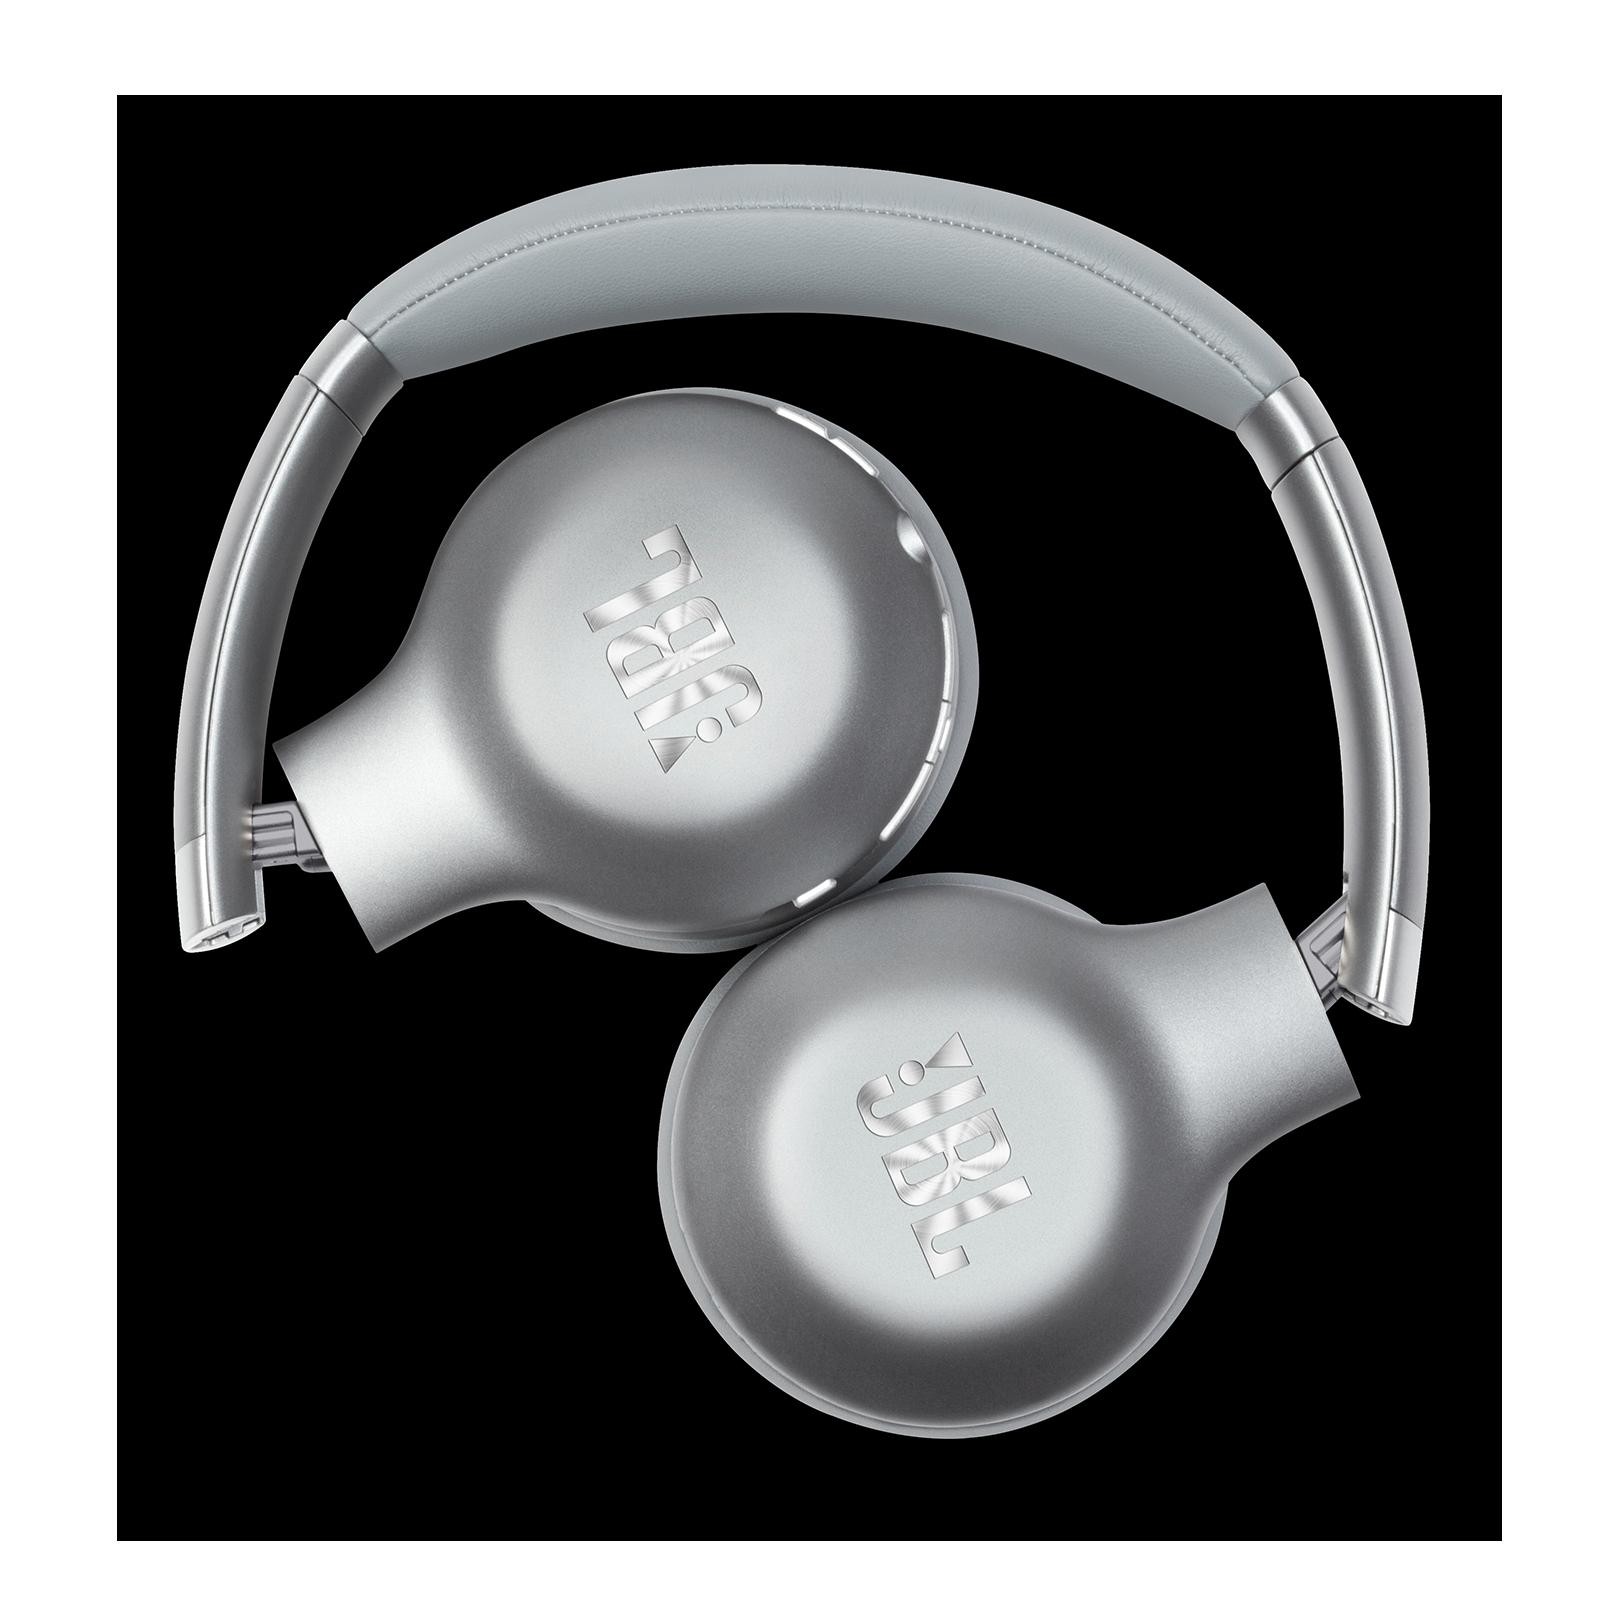 EVEREST™ 310GA - Silver - Wireless on-ear headphones - Detailshot 1